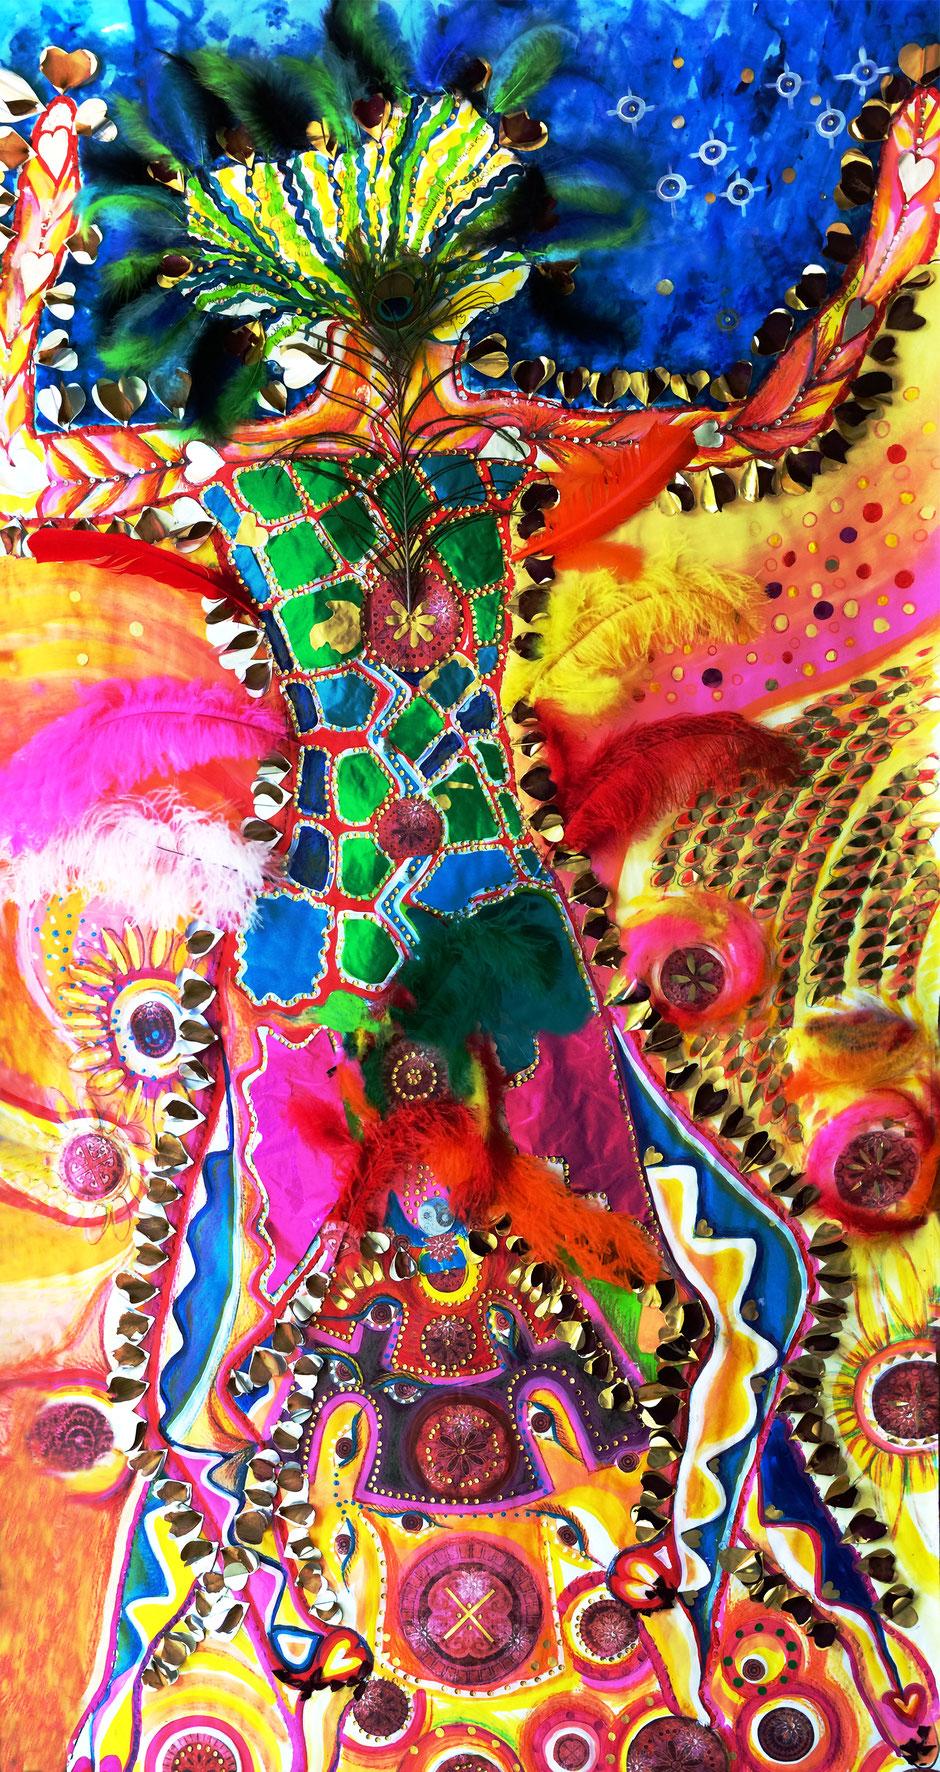 Butterfly Shaman 2016